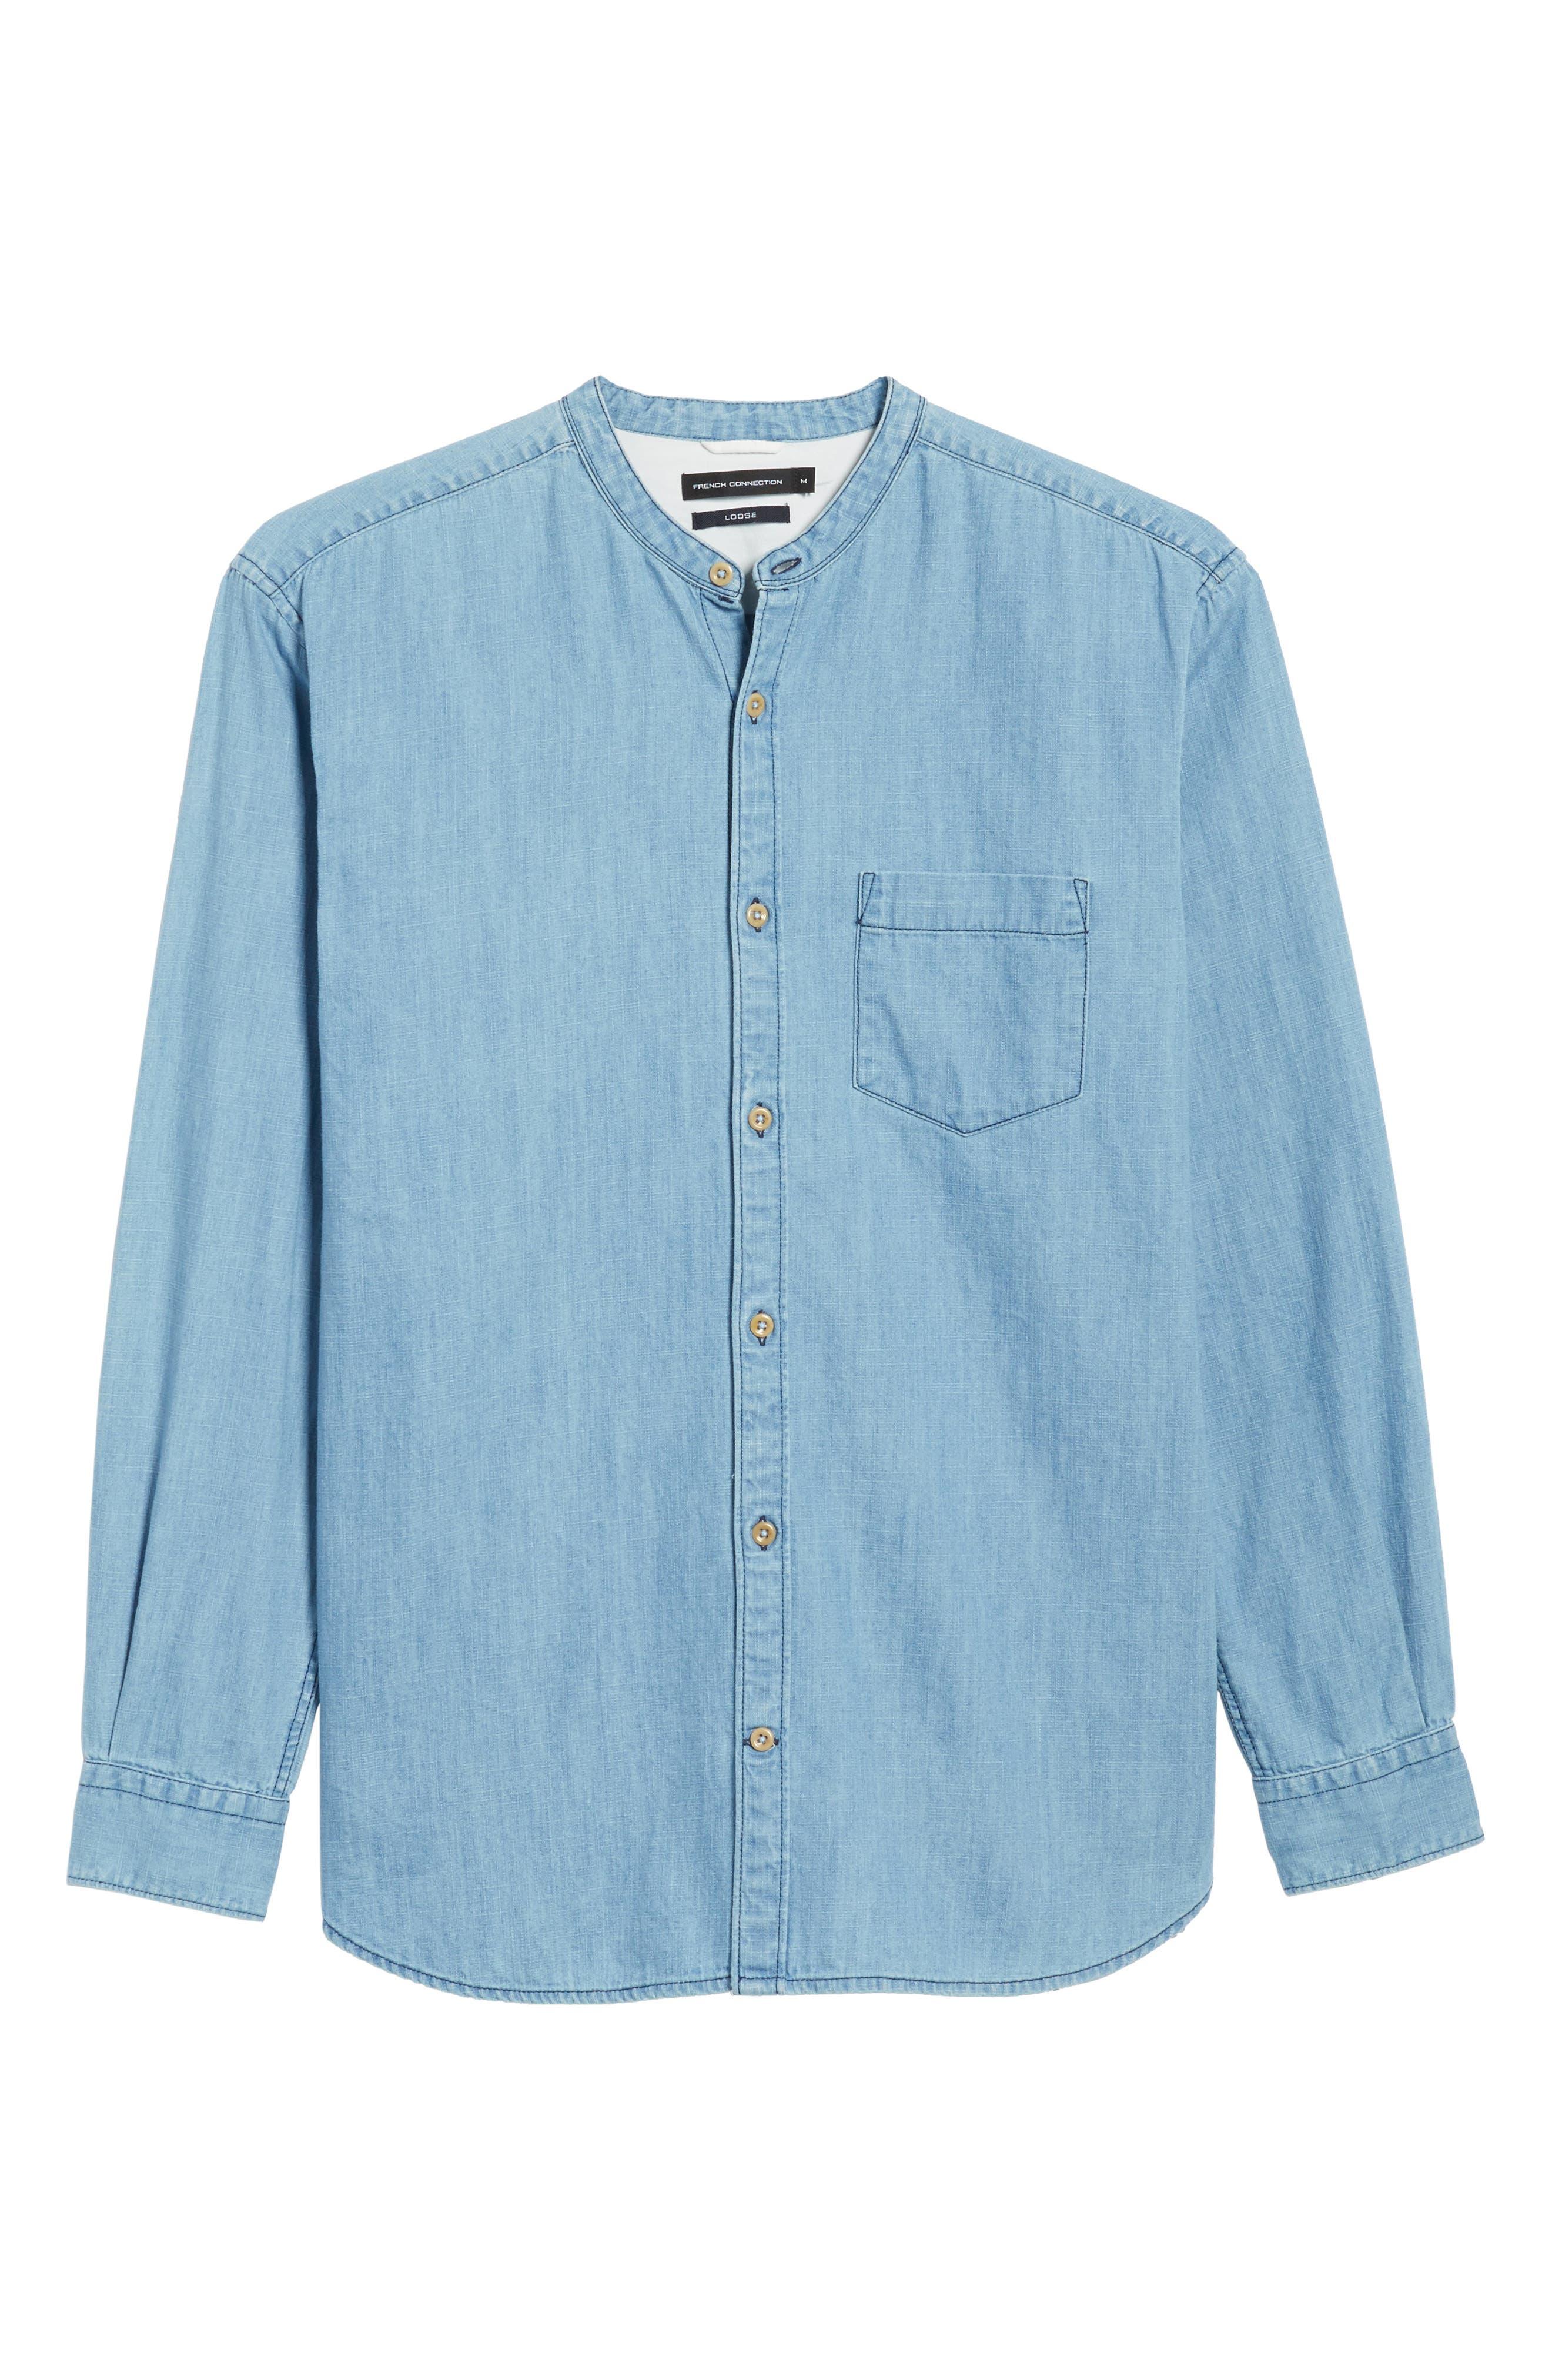 Core Denim Regular Fit Sport Shirt,                             Alternate thumbnail 6, color,                             Bleach